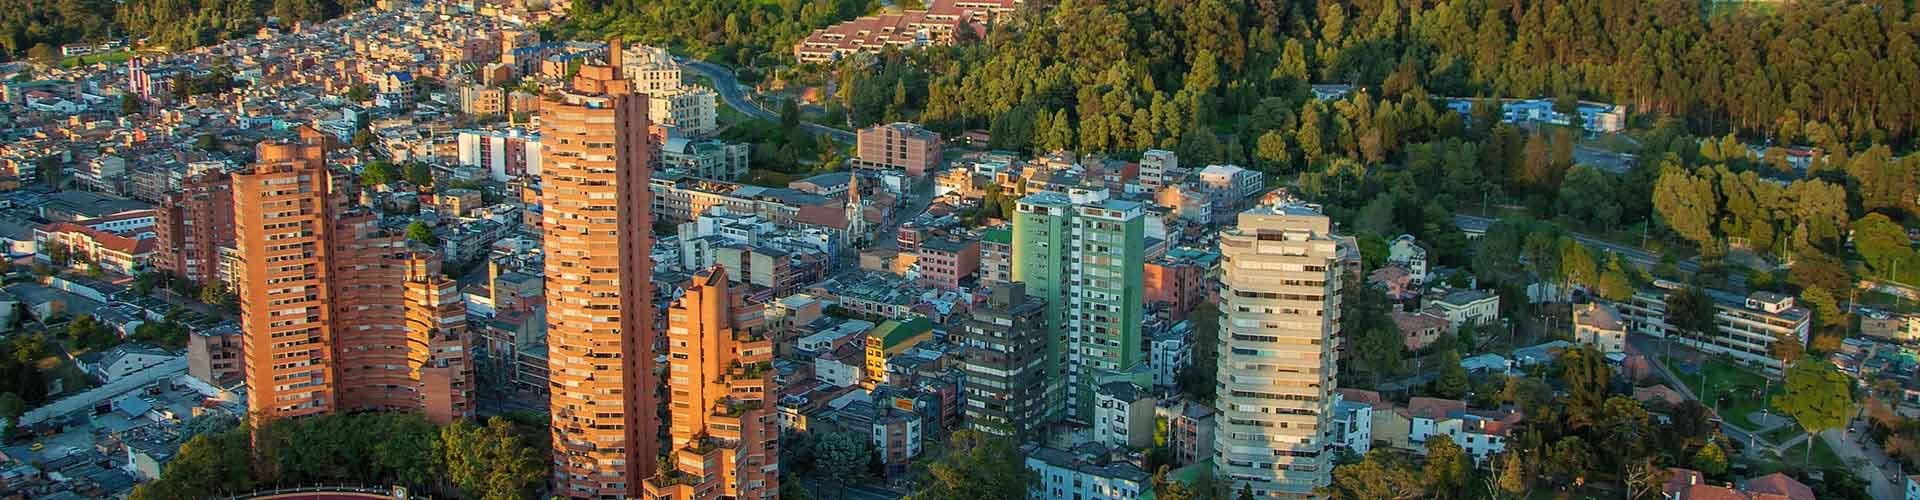 Bogotá - Albergues en Bogotá. Mapas de Bogotá, Fotos y Comentarios para cada Albergue en Bogotá.